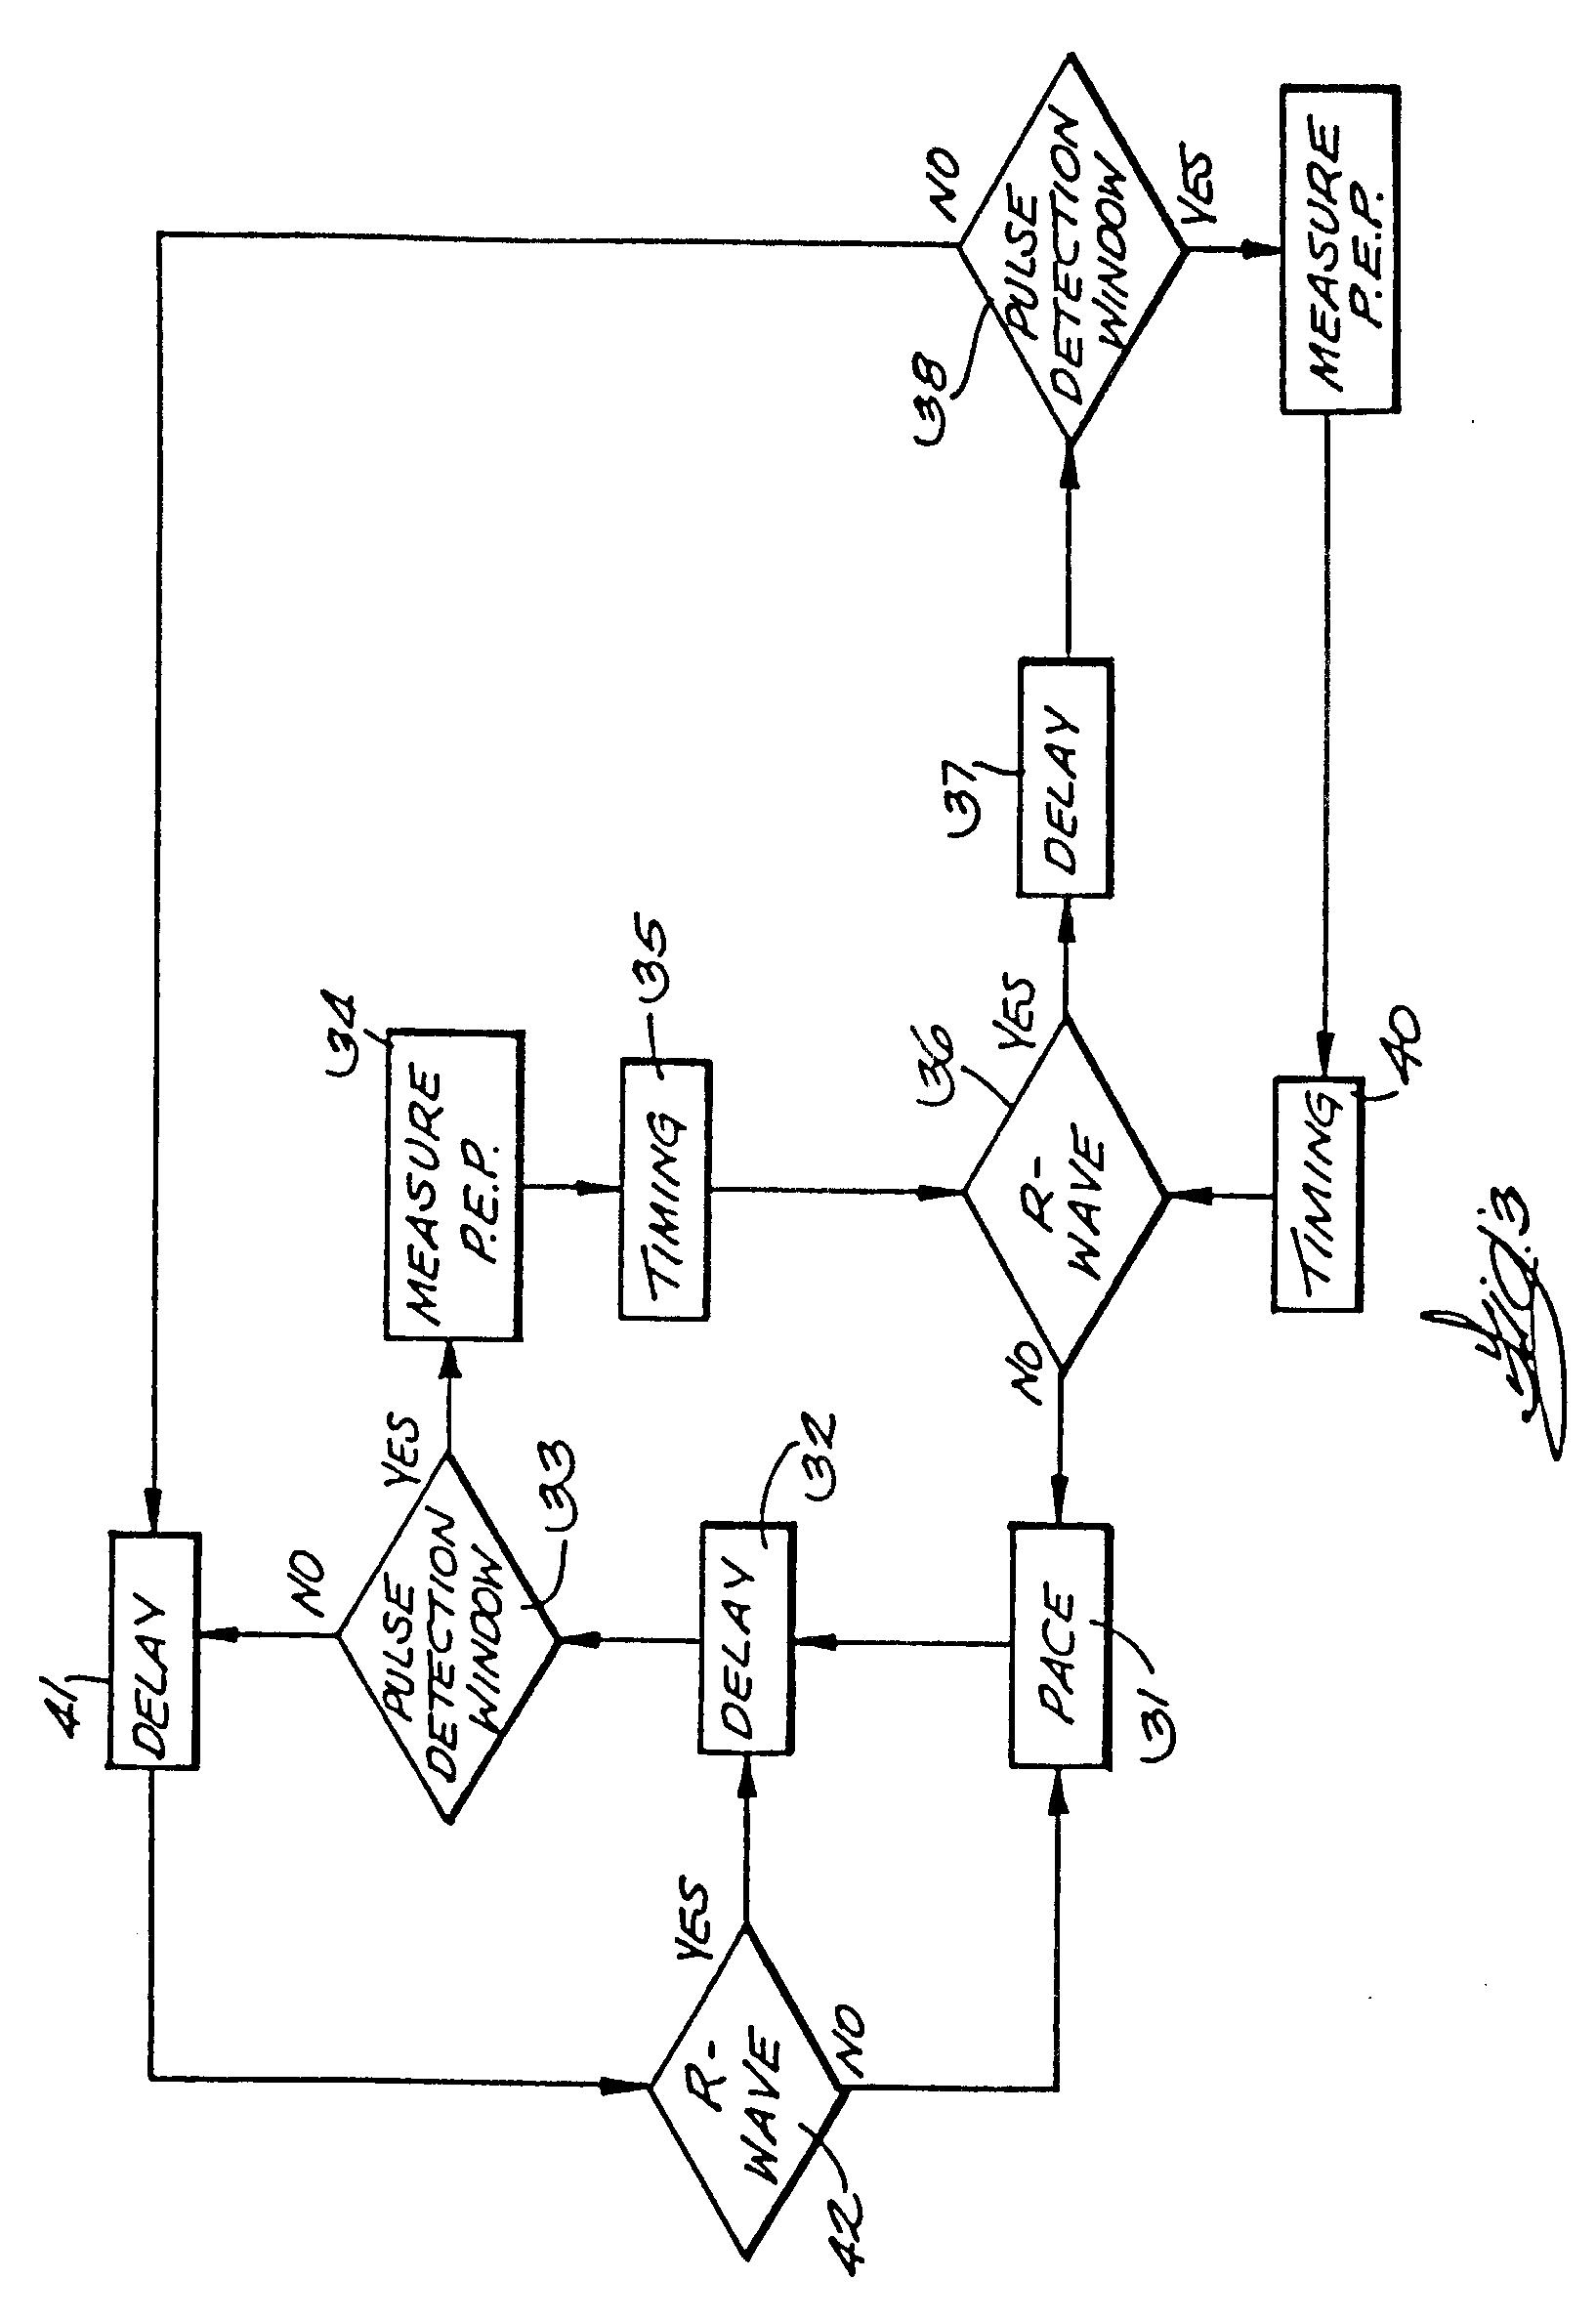 pacemaker circuit diagram  u2013 the wiring diagram